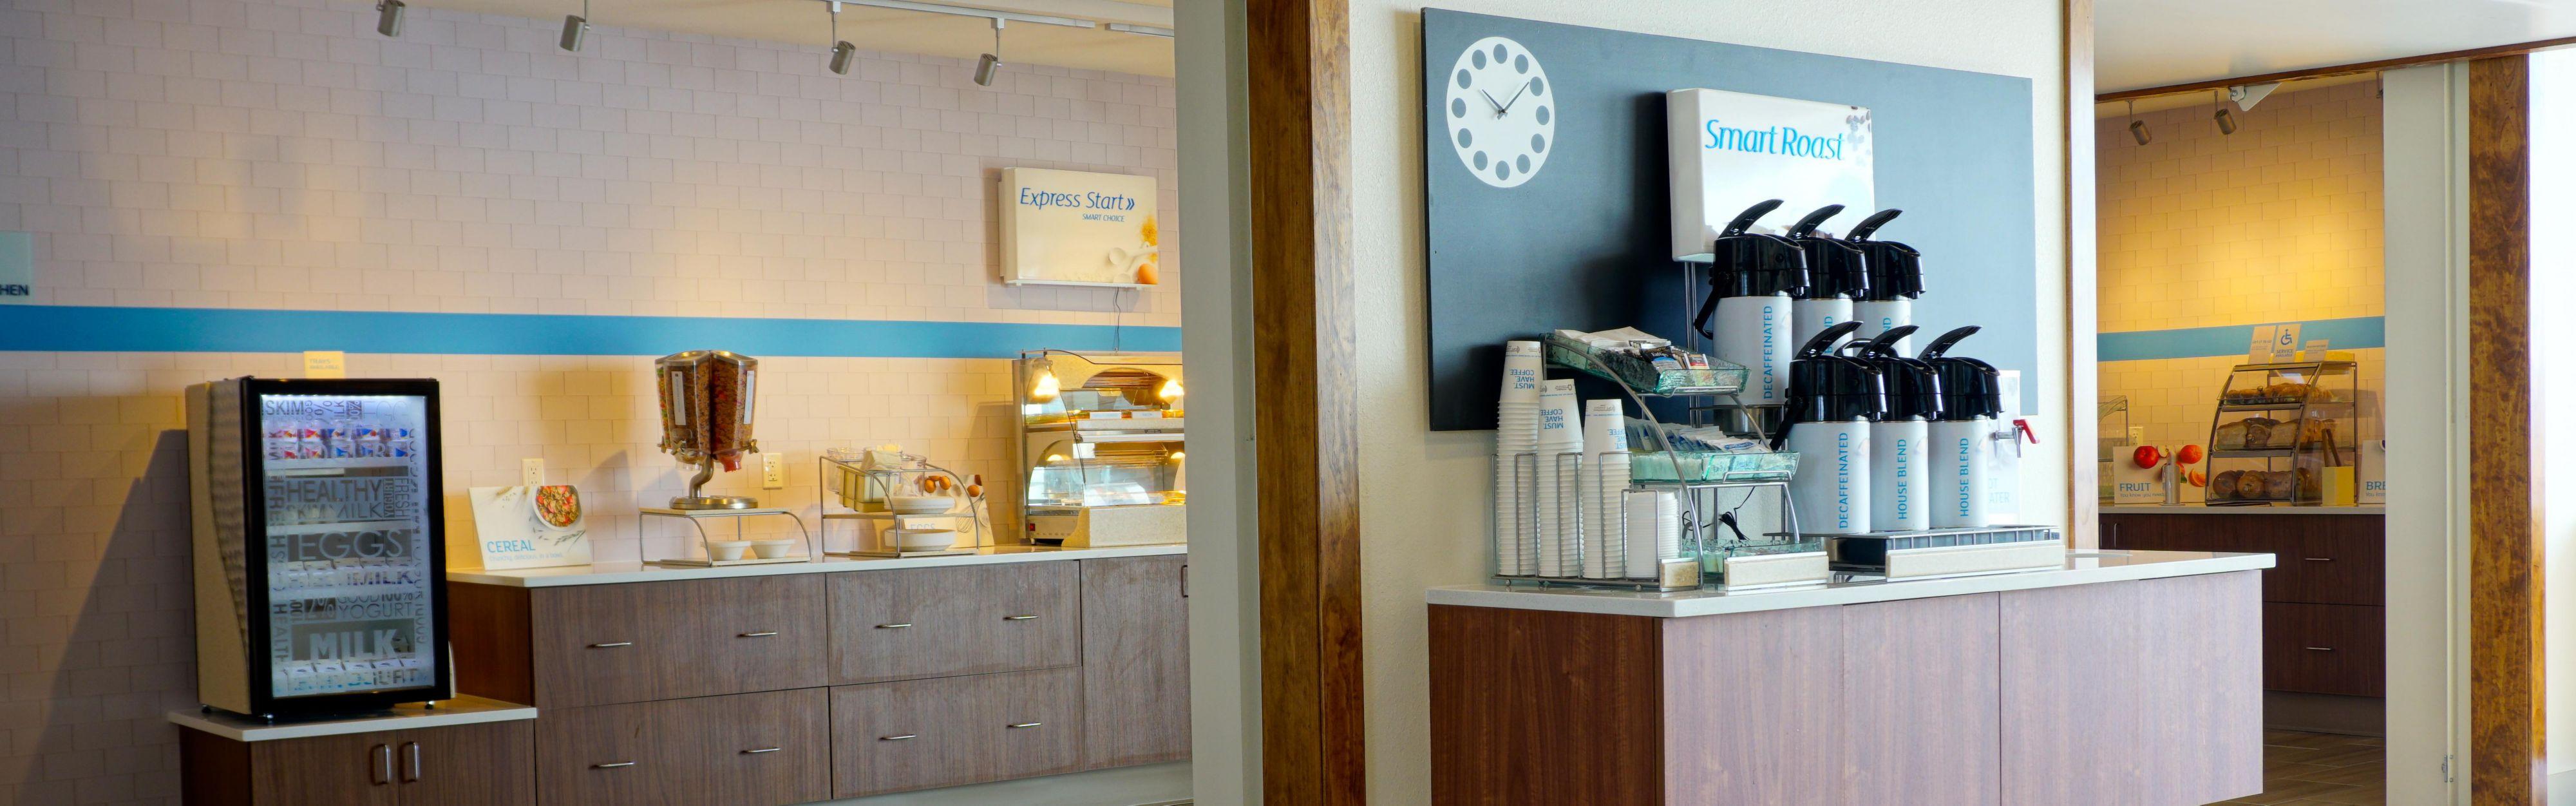 Holiday Inn Express & Suites Omaha - Millard Area image 3